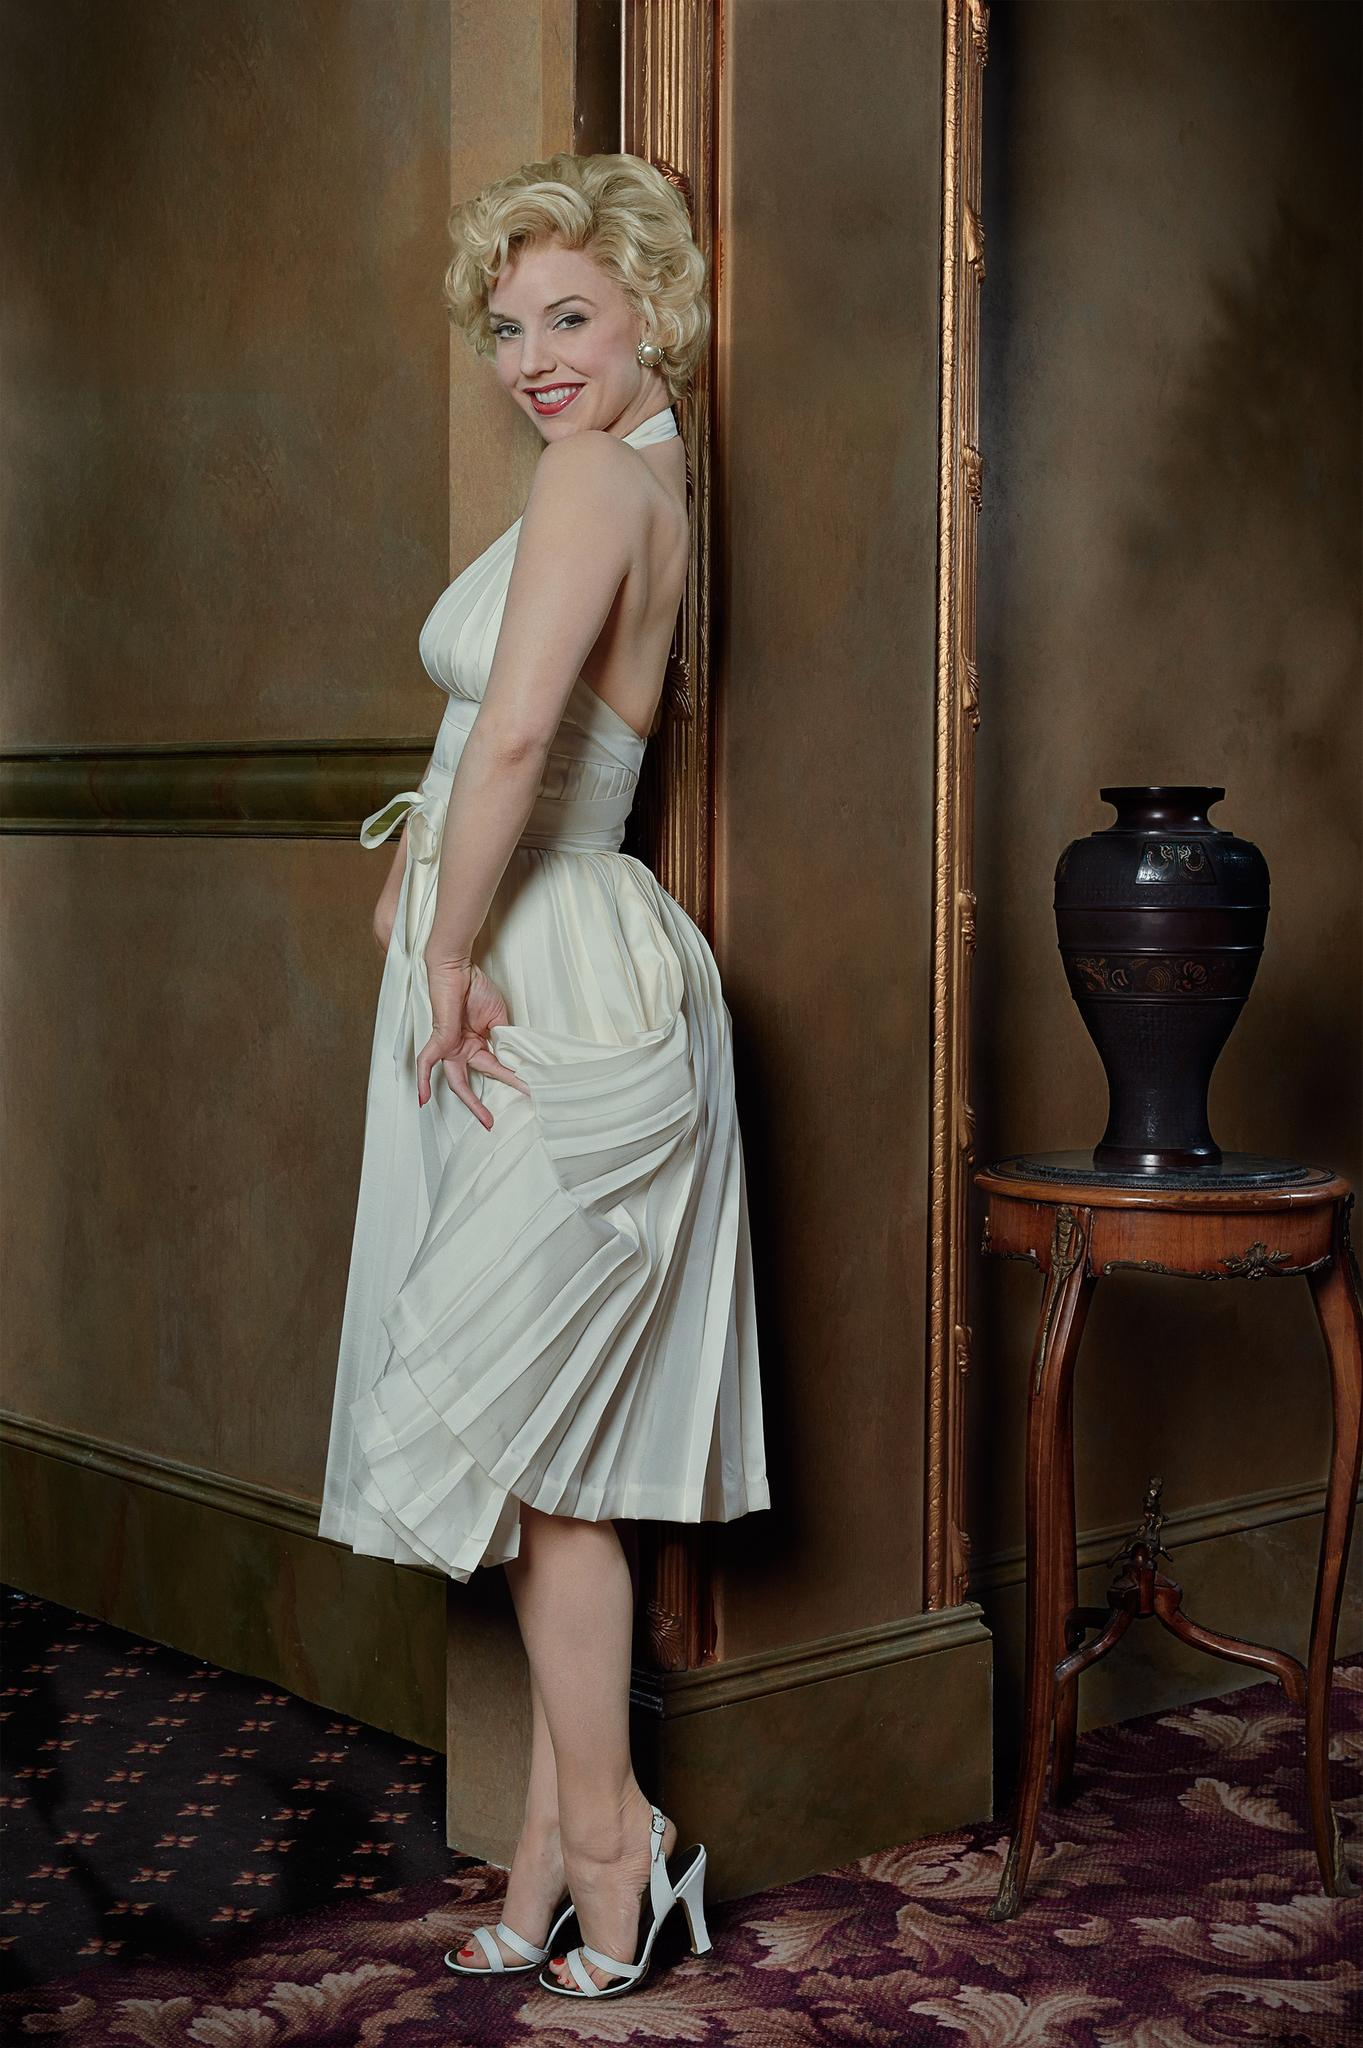 Citaten Marilyn Monroe Movie : Tajný život marilyn monroe sleduj filmy online zdarma na